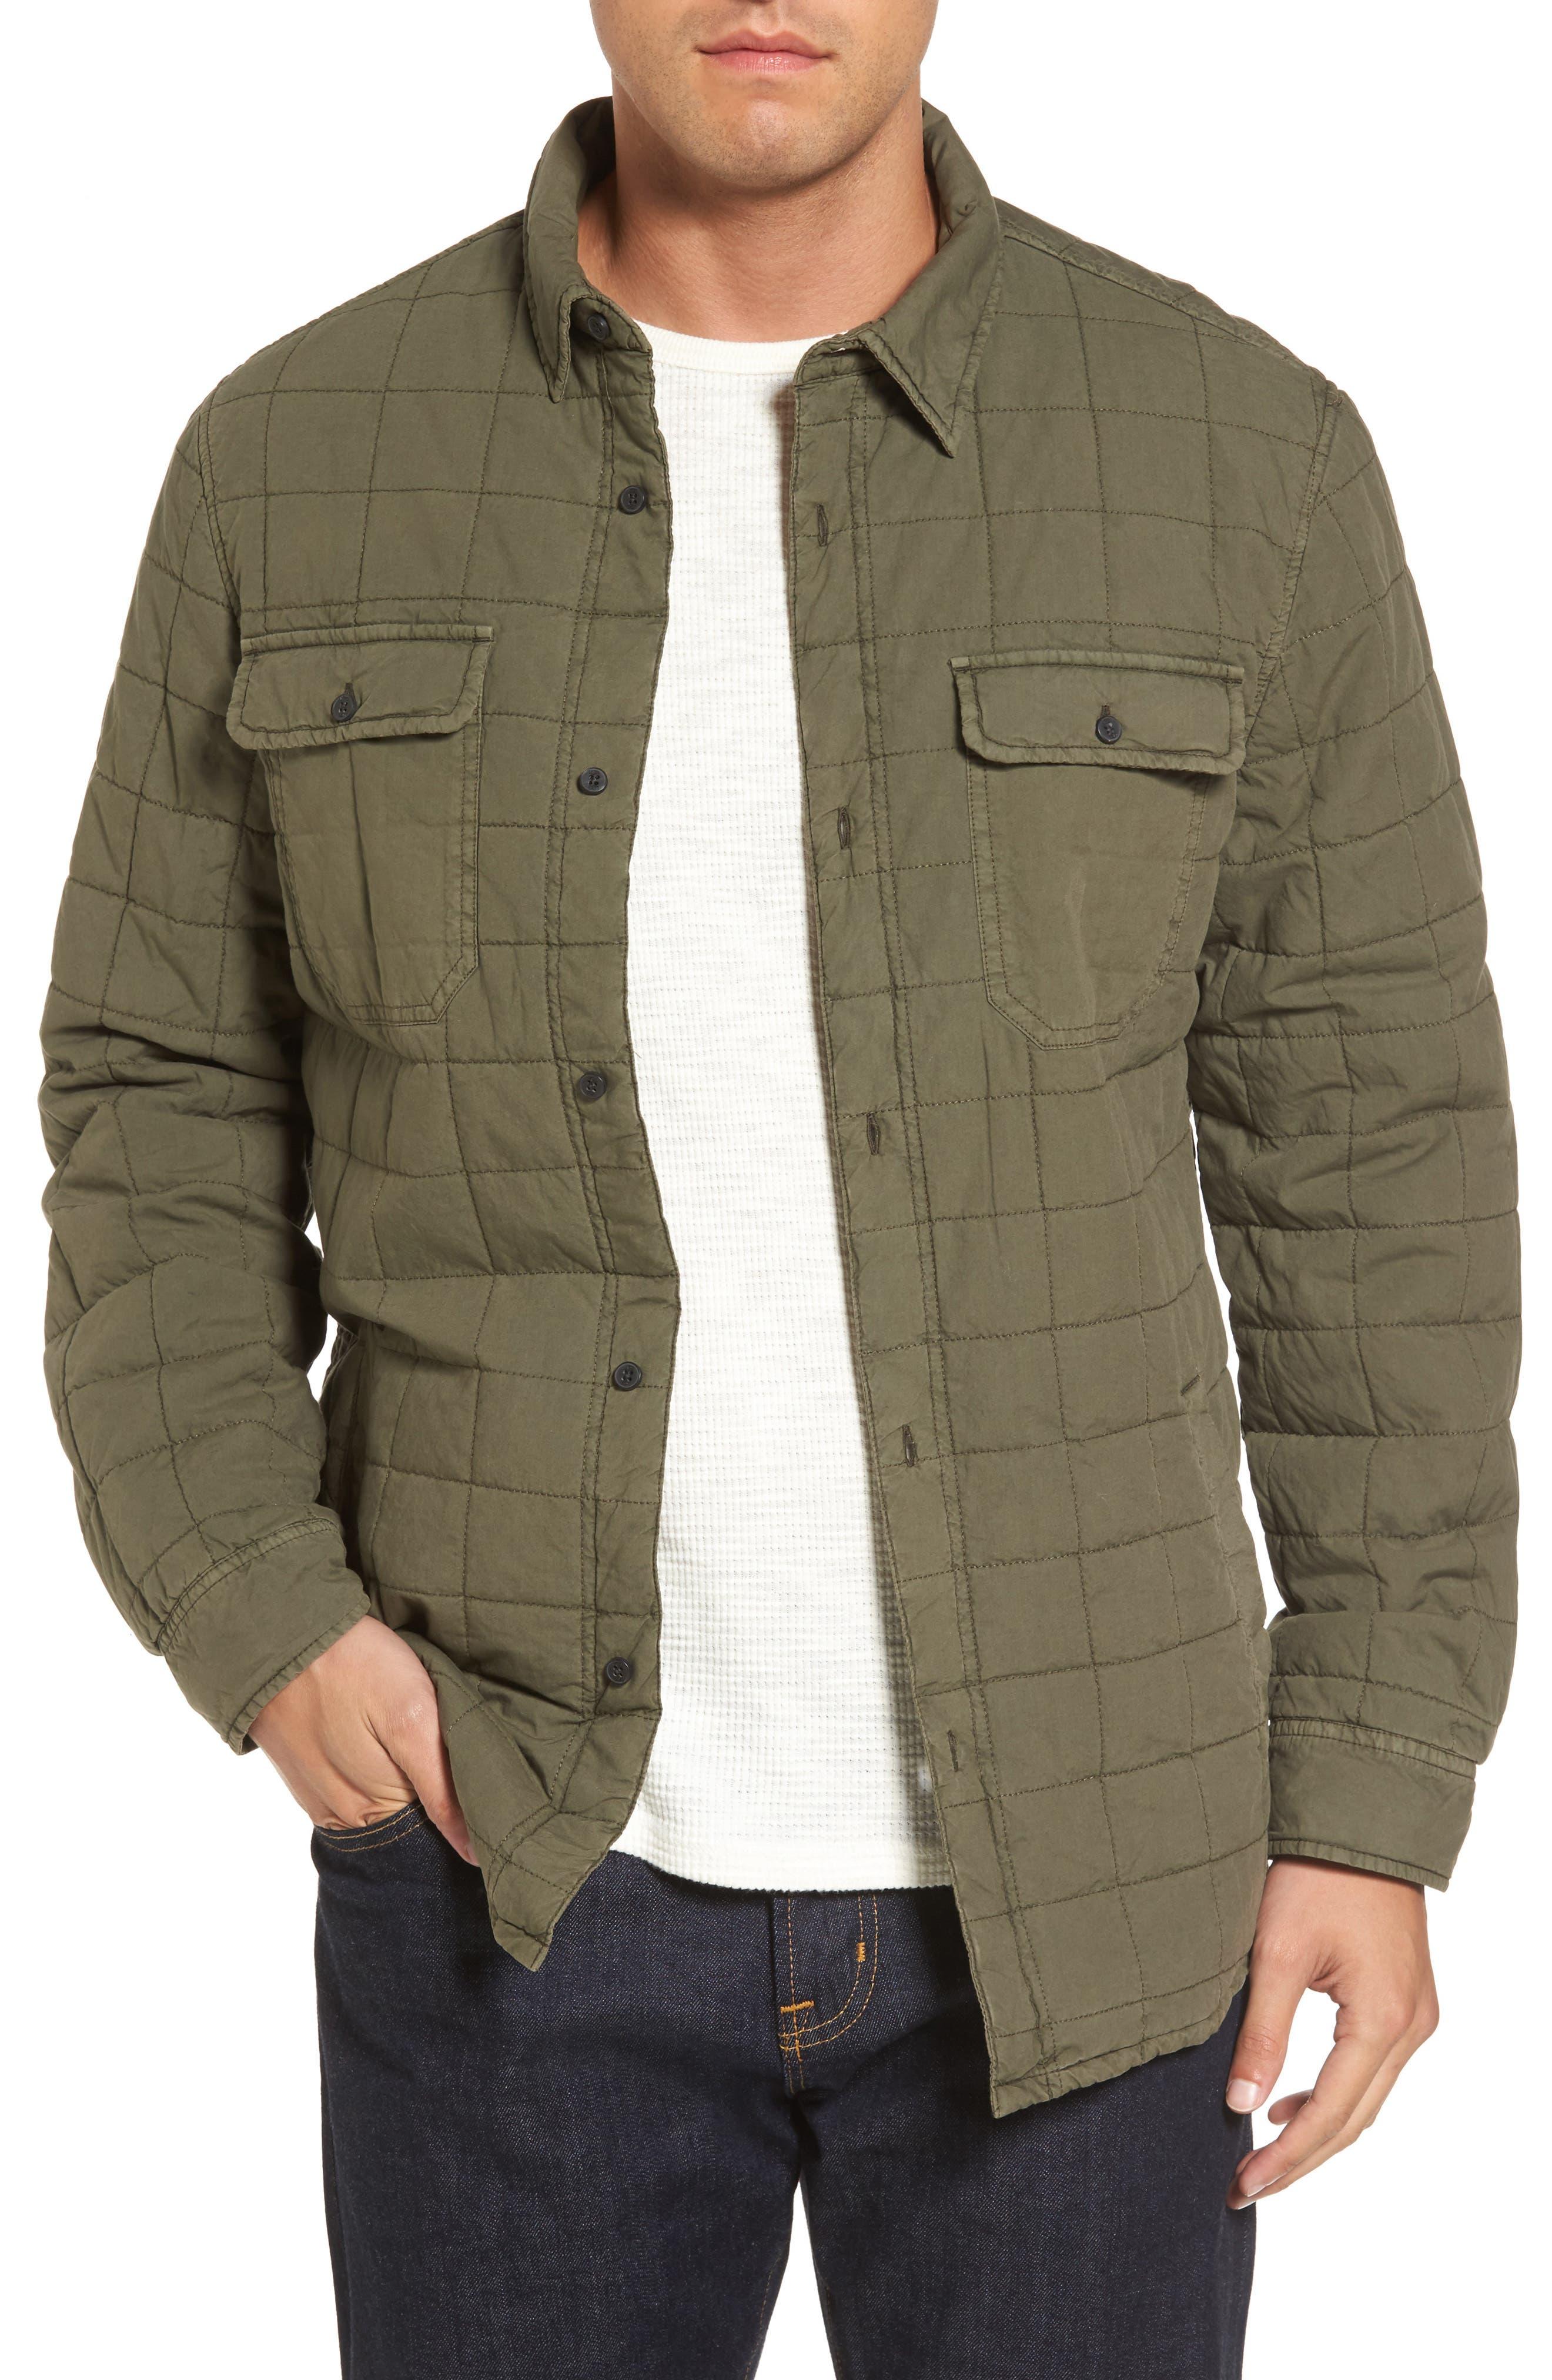 Alternate Image 1 Selected - UGG® Quilted Shirt Jacket